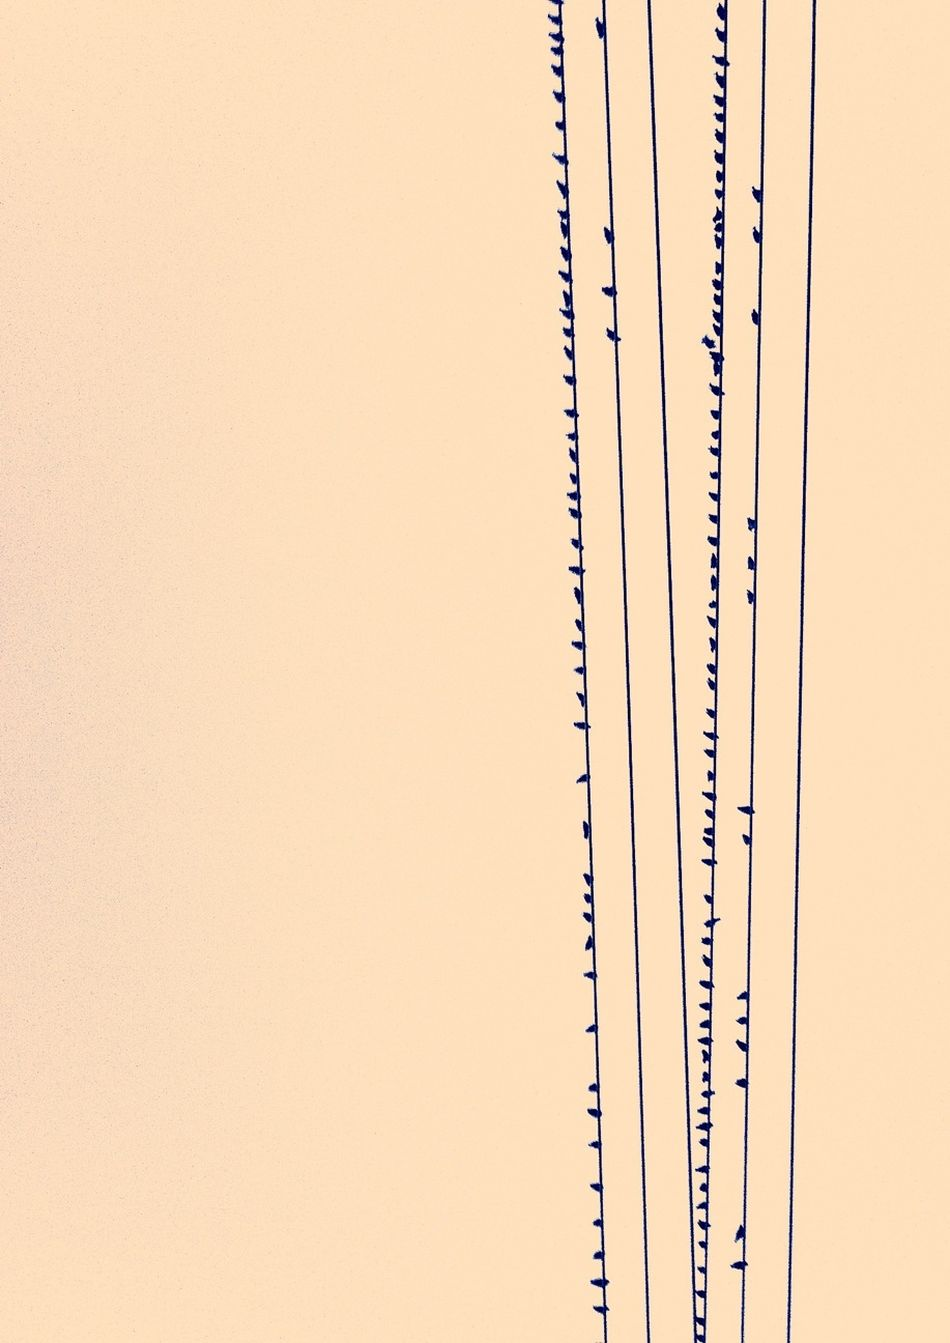 Minimalism The Minimals (less Edit Juxt Photography) Minimalobsession Birds On A Wire